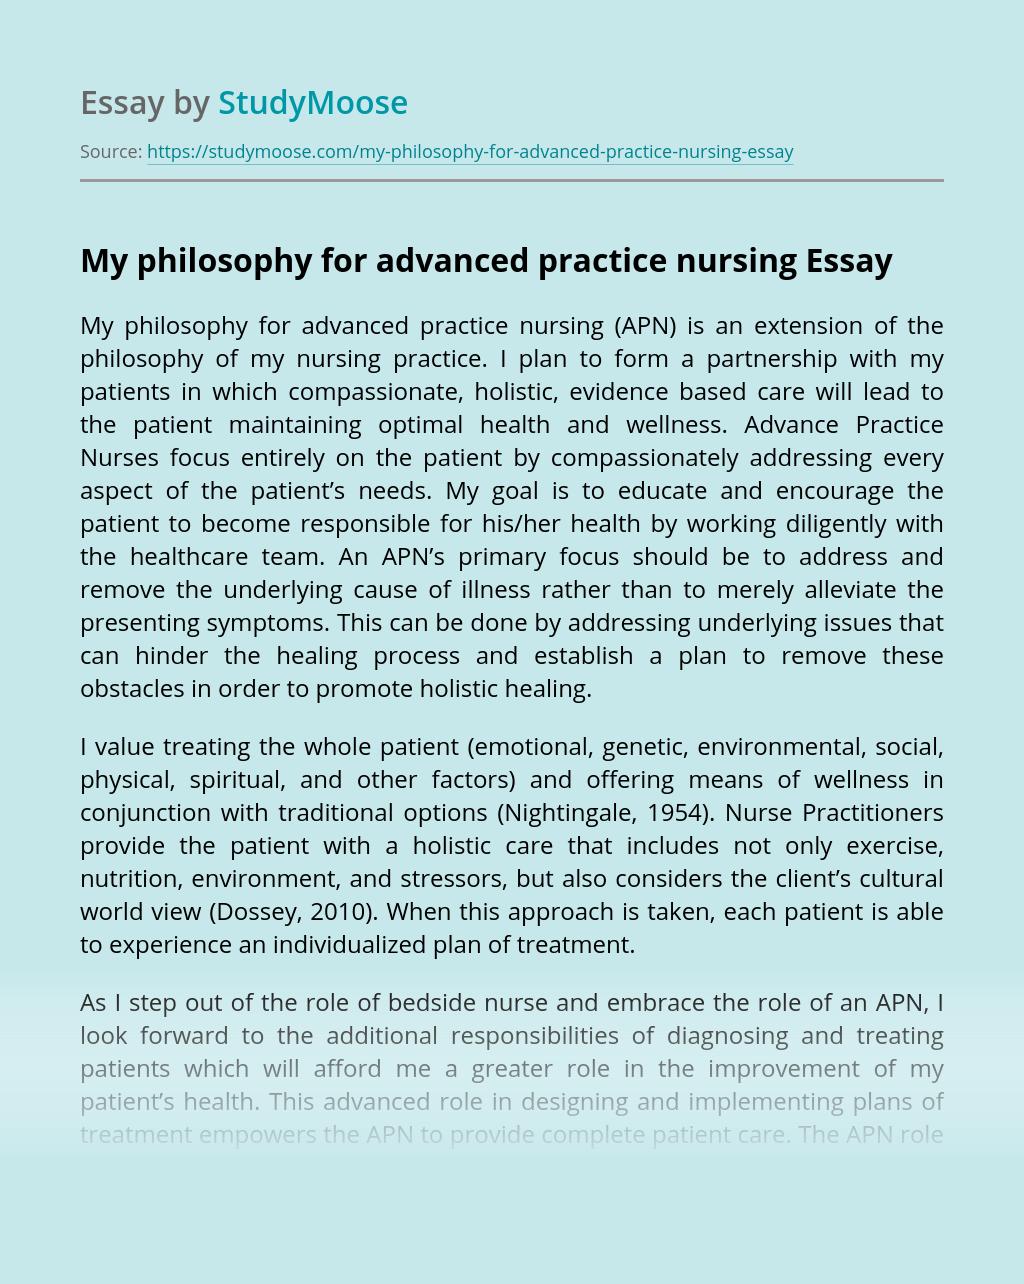 My philosophy for advanced practice nursing